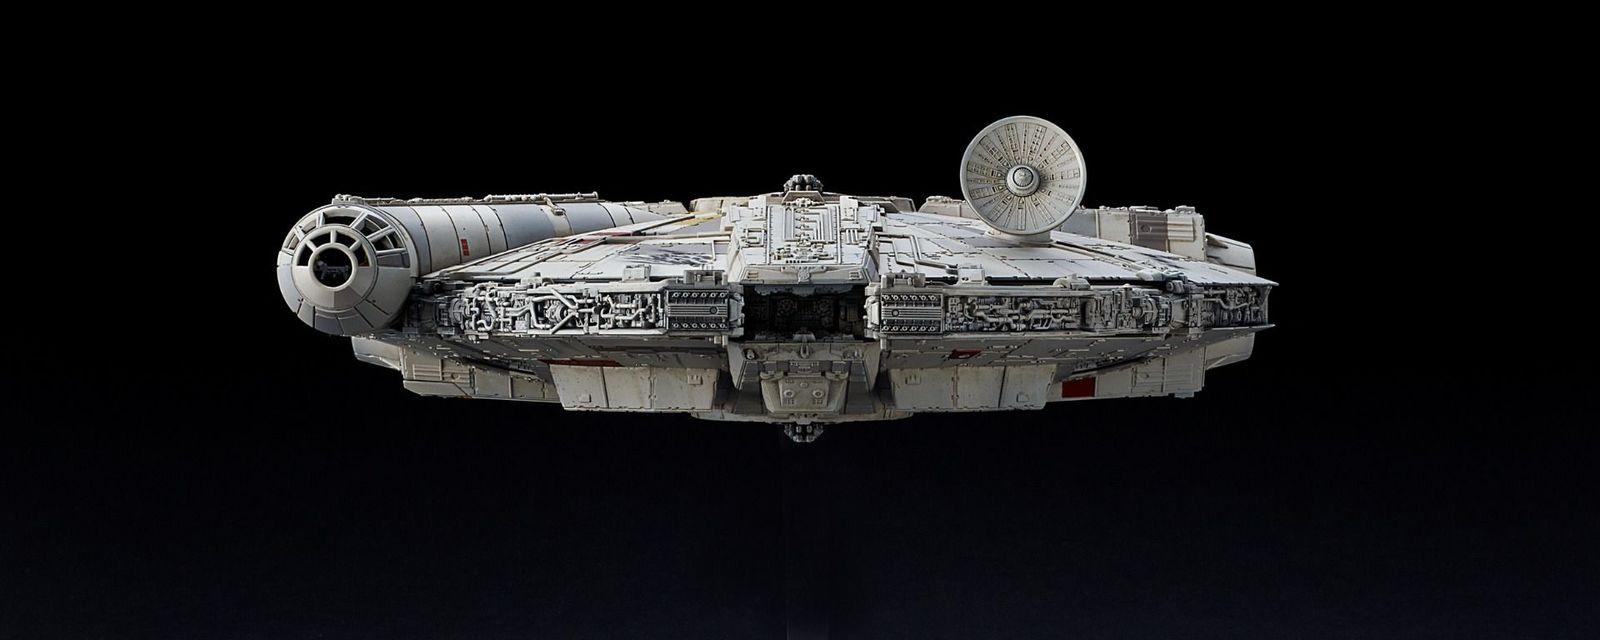 1/144 Millennium Falcon- Model Kit image